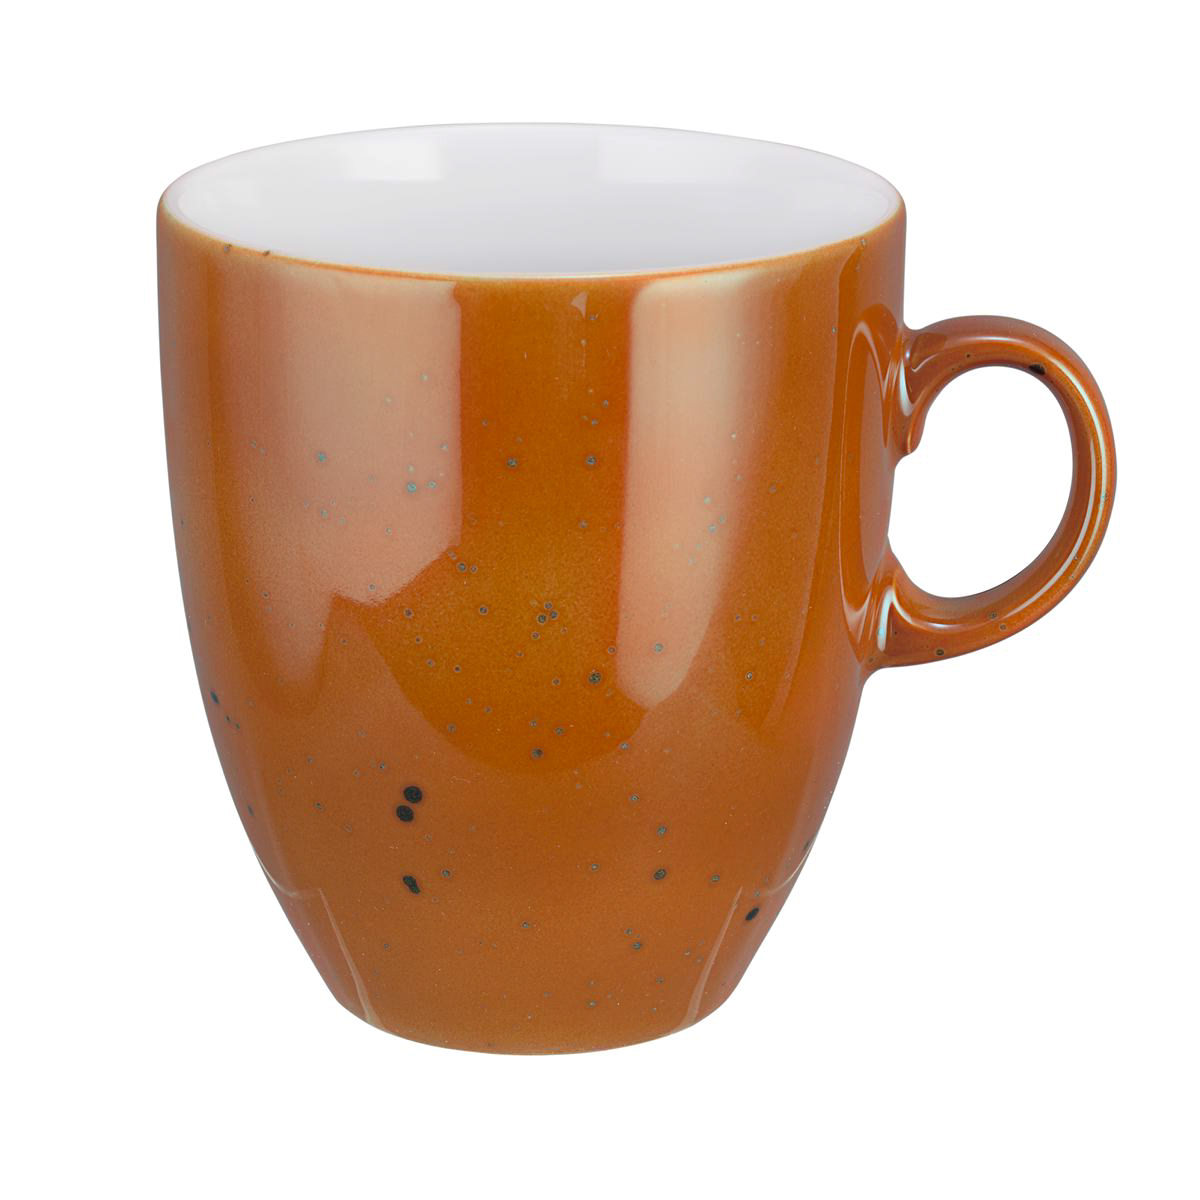 Kaffeetasse 0,4 l terracotta - Serie Coup Fine Dining